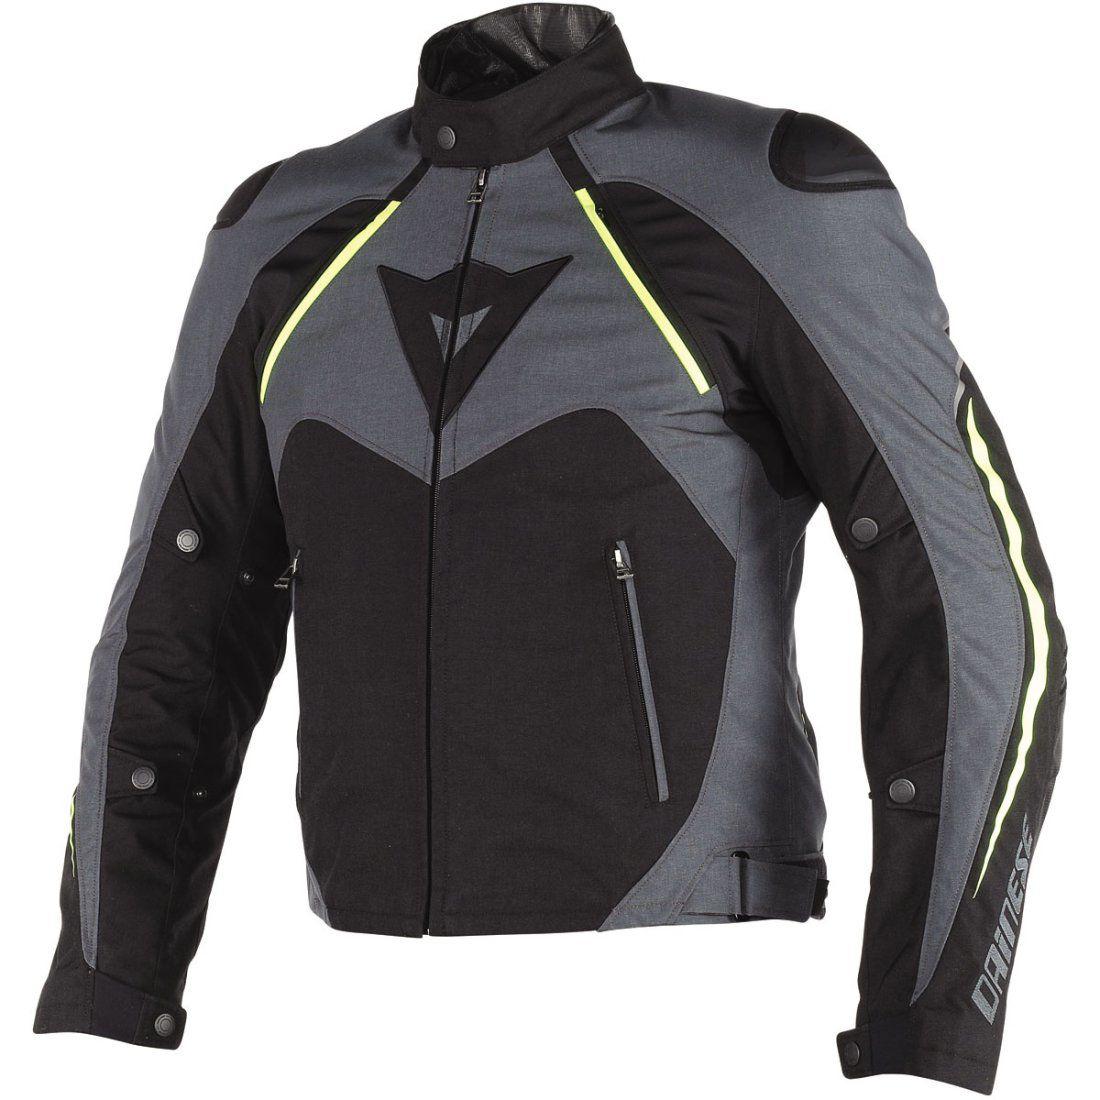 JAQUETA DAINESE HAWKER D-DRY BLACK EBONY FLUO YELLOW  - Motosports